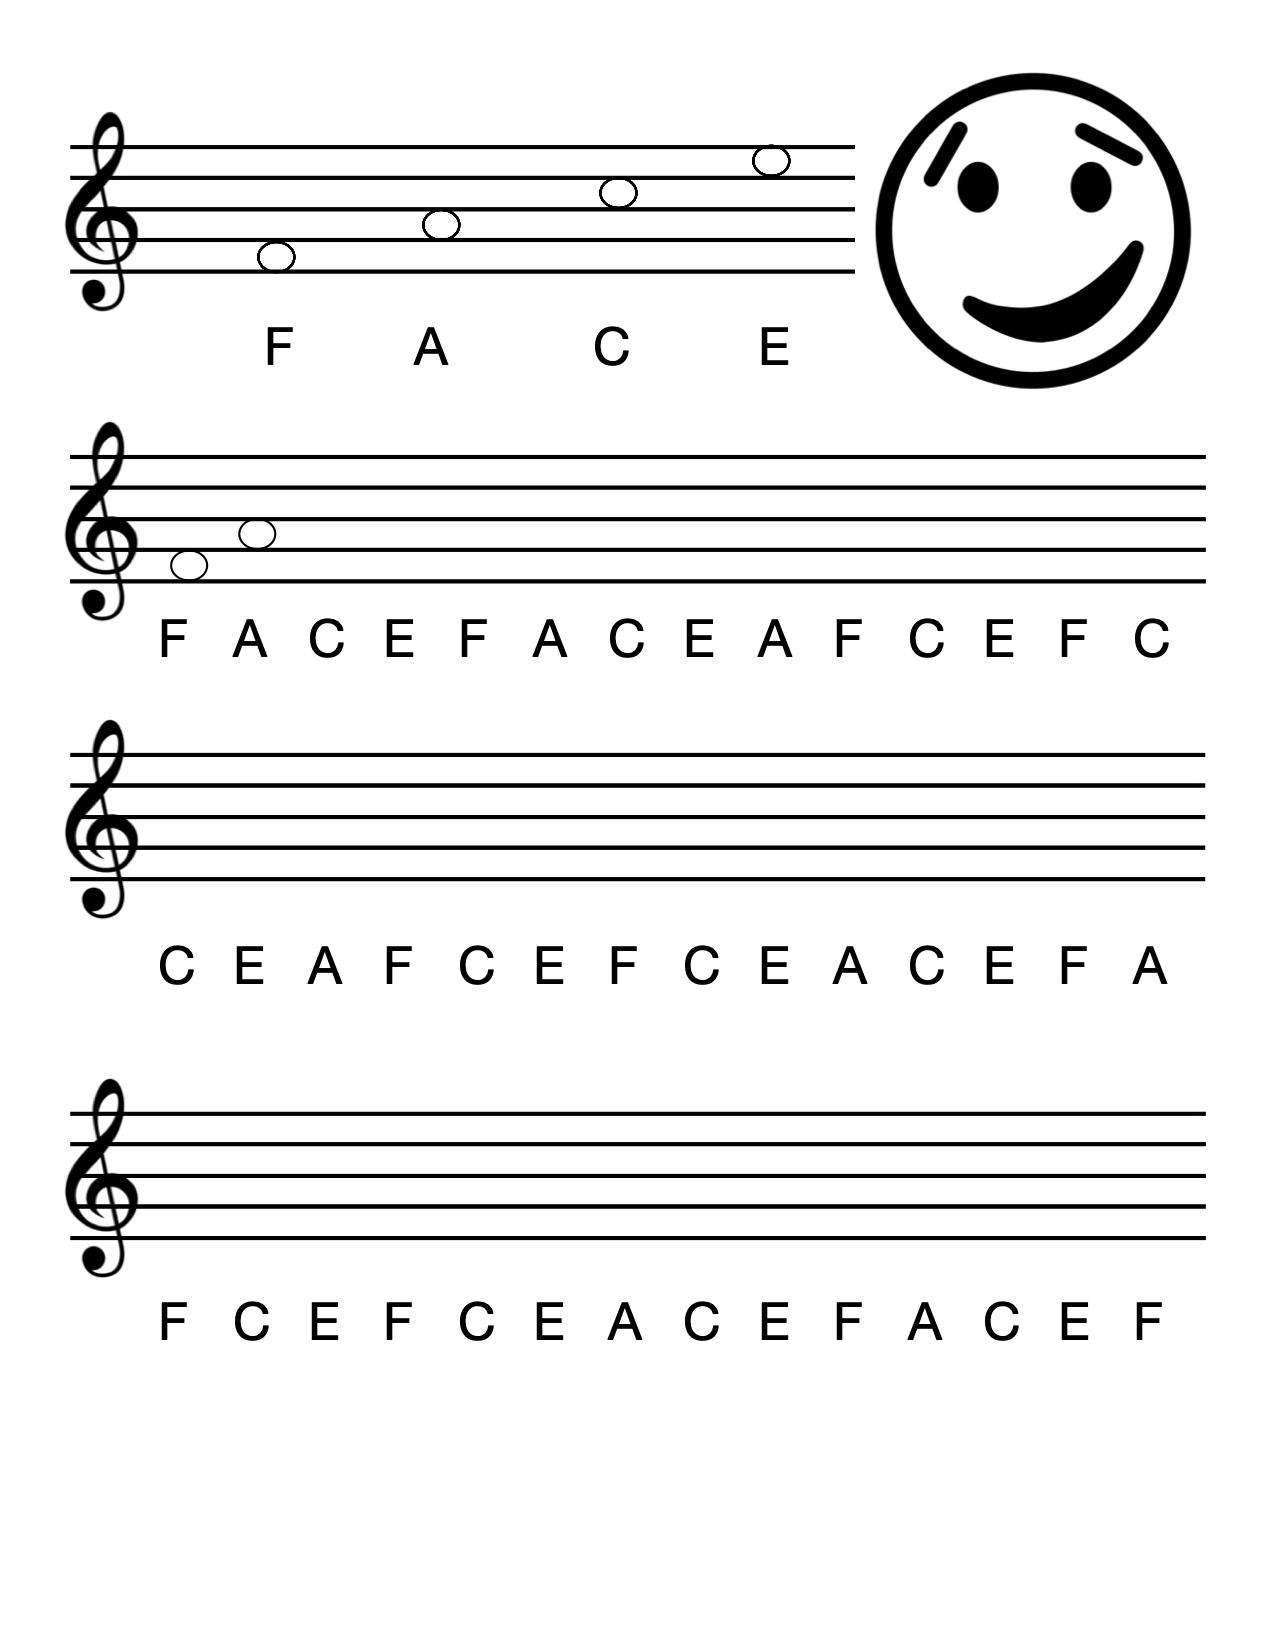 Note Speller PDF Free Download - image P10_FACE-1-1-1-1-1-1-1-1-1-1-1-1-1-1-1-1-1-1-1-1-1-1-1-1-1-1-1-1-1-1-1-1-1-1-1-1-1-1-1-1-1-1-1-1-1-1-1-1-1-1-1-1-1-1-1-1-1-1-1-1-1-1-1-1-1-1-1-1-1-1-1-1-1-1-1-1-1-1-1-1-1-1-1-1-1-1-1-1-1-1-1-1-1-1-1 on https://musicmasterlab.com